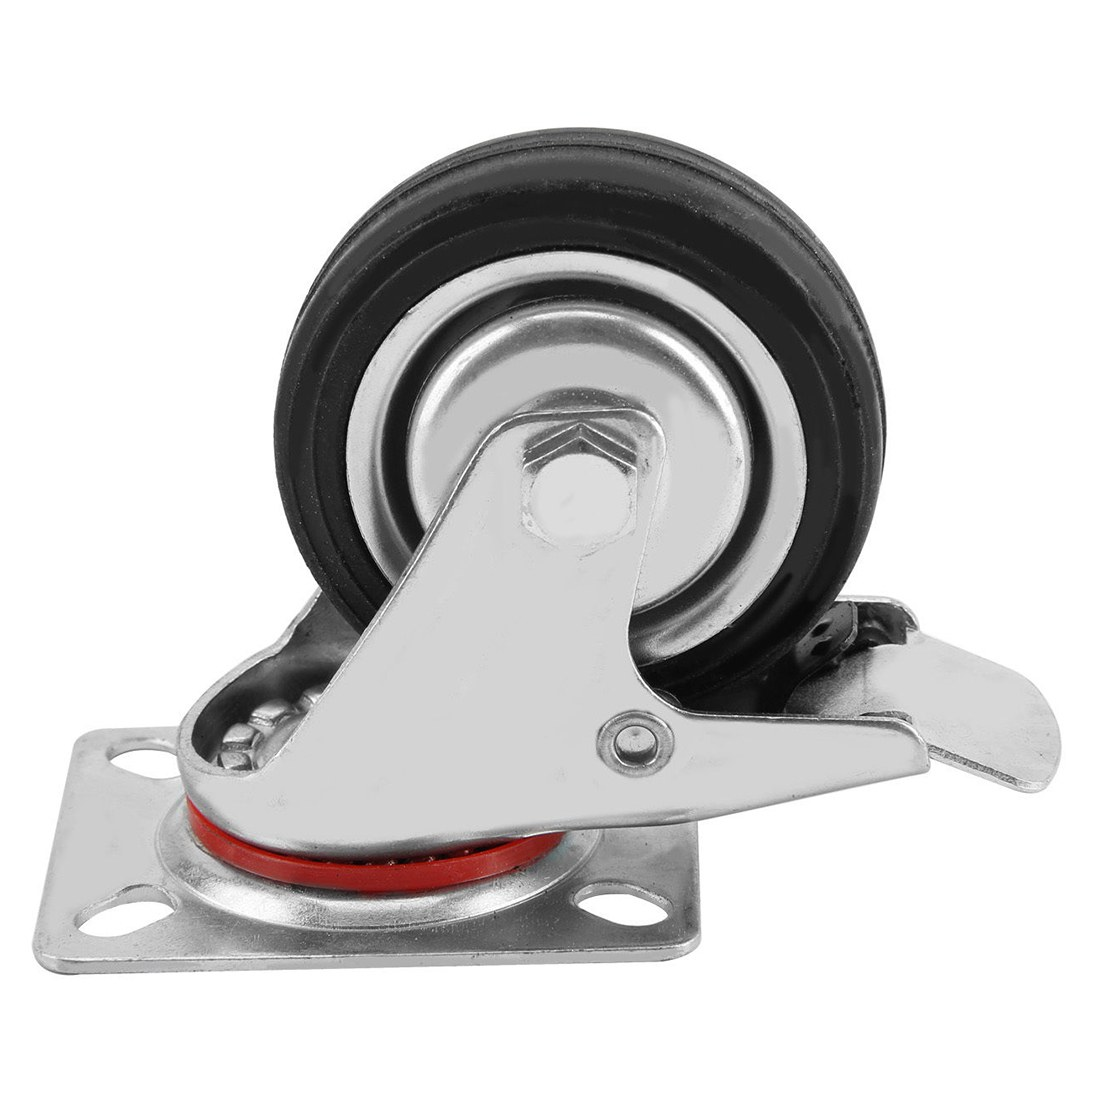 Hardware 4 Pcs Heavy Duty 125x27mm Furniture Casters Rubber Swivel Castor Trolley Caster Brake 360 Deg 5 Replacement Office Chair Wheels More Discounts Surprises